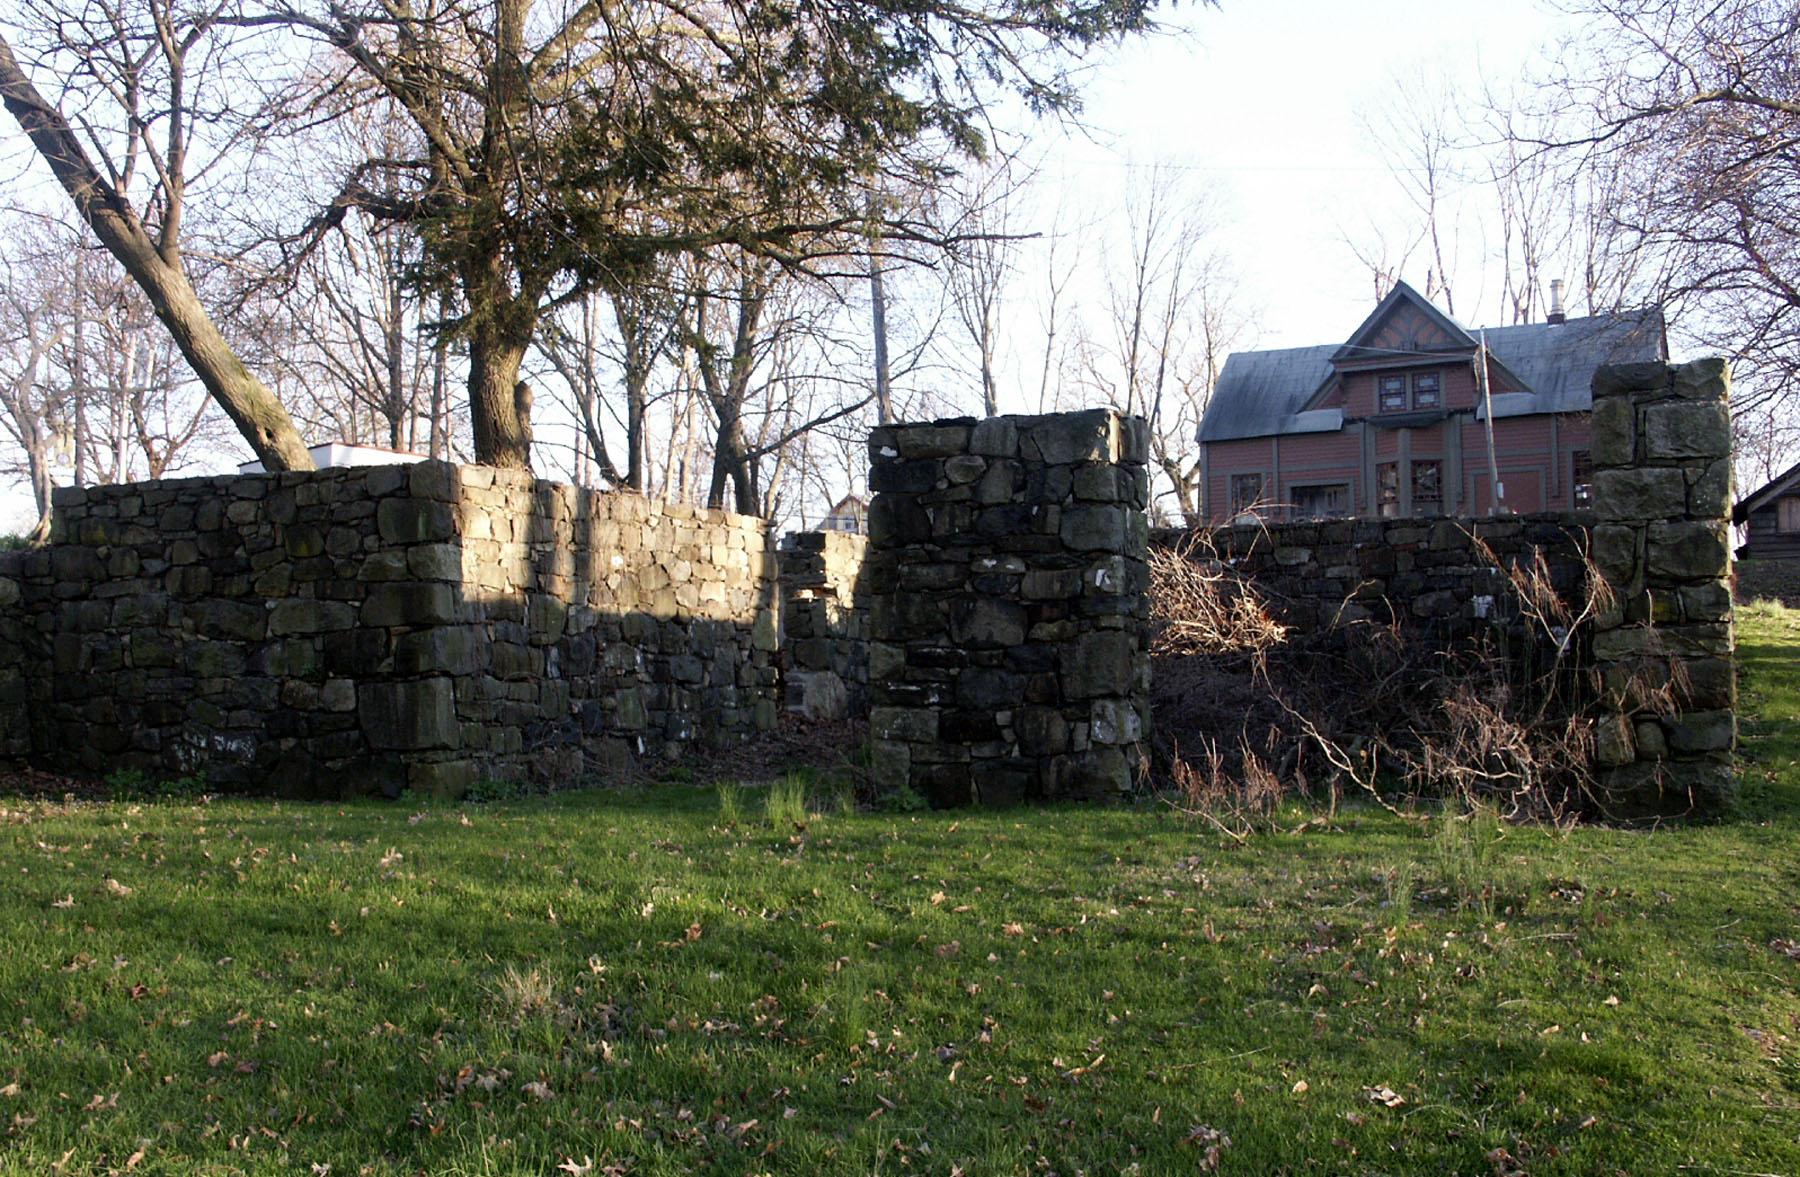 Remains of Barn 4-13-05 647PM 1.JPG